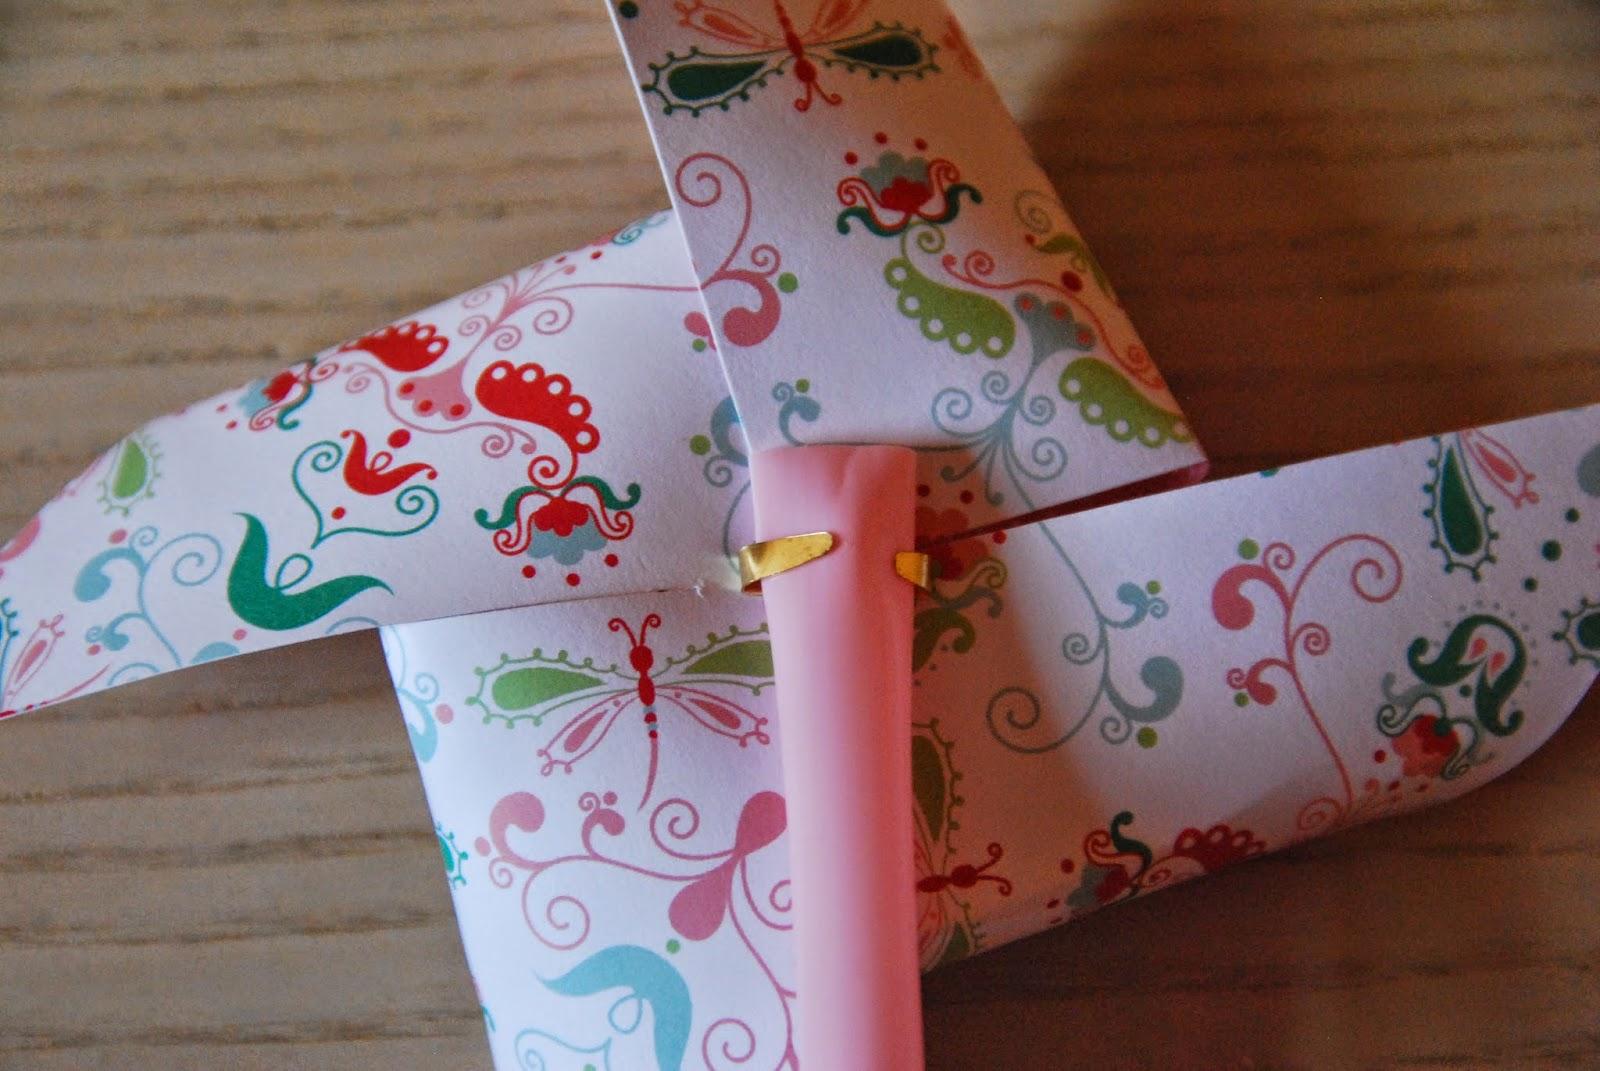 Diy molinillo de papel para decorar sweet bodas - Papel para decorar ...